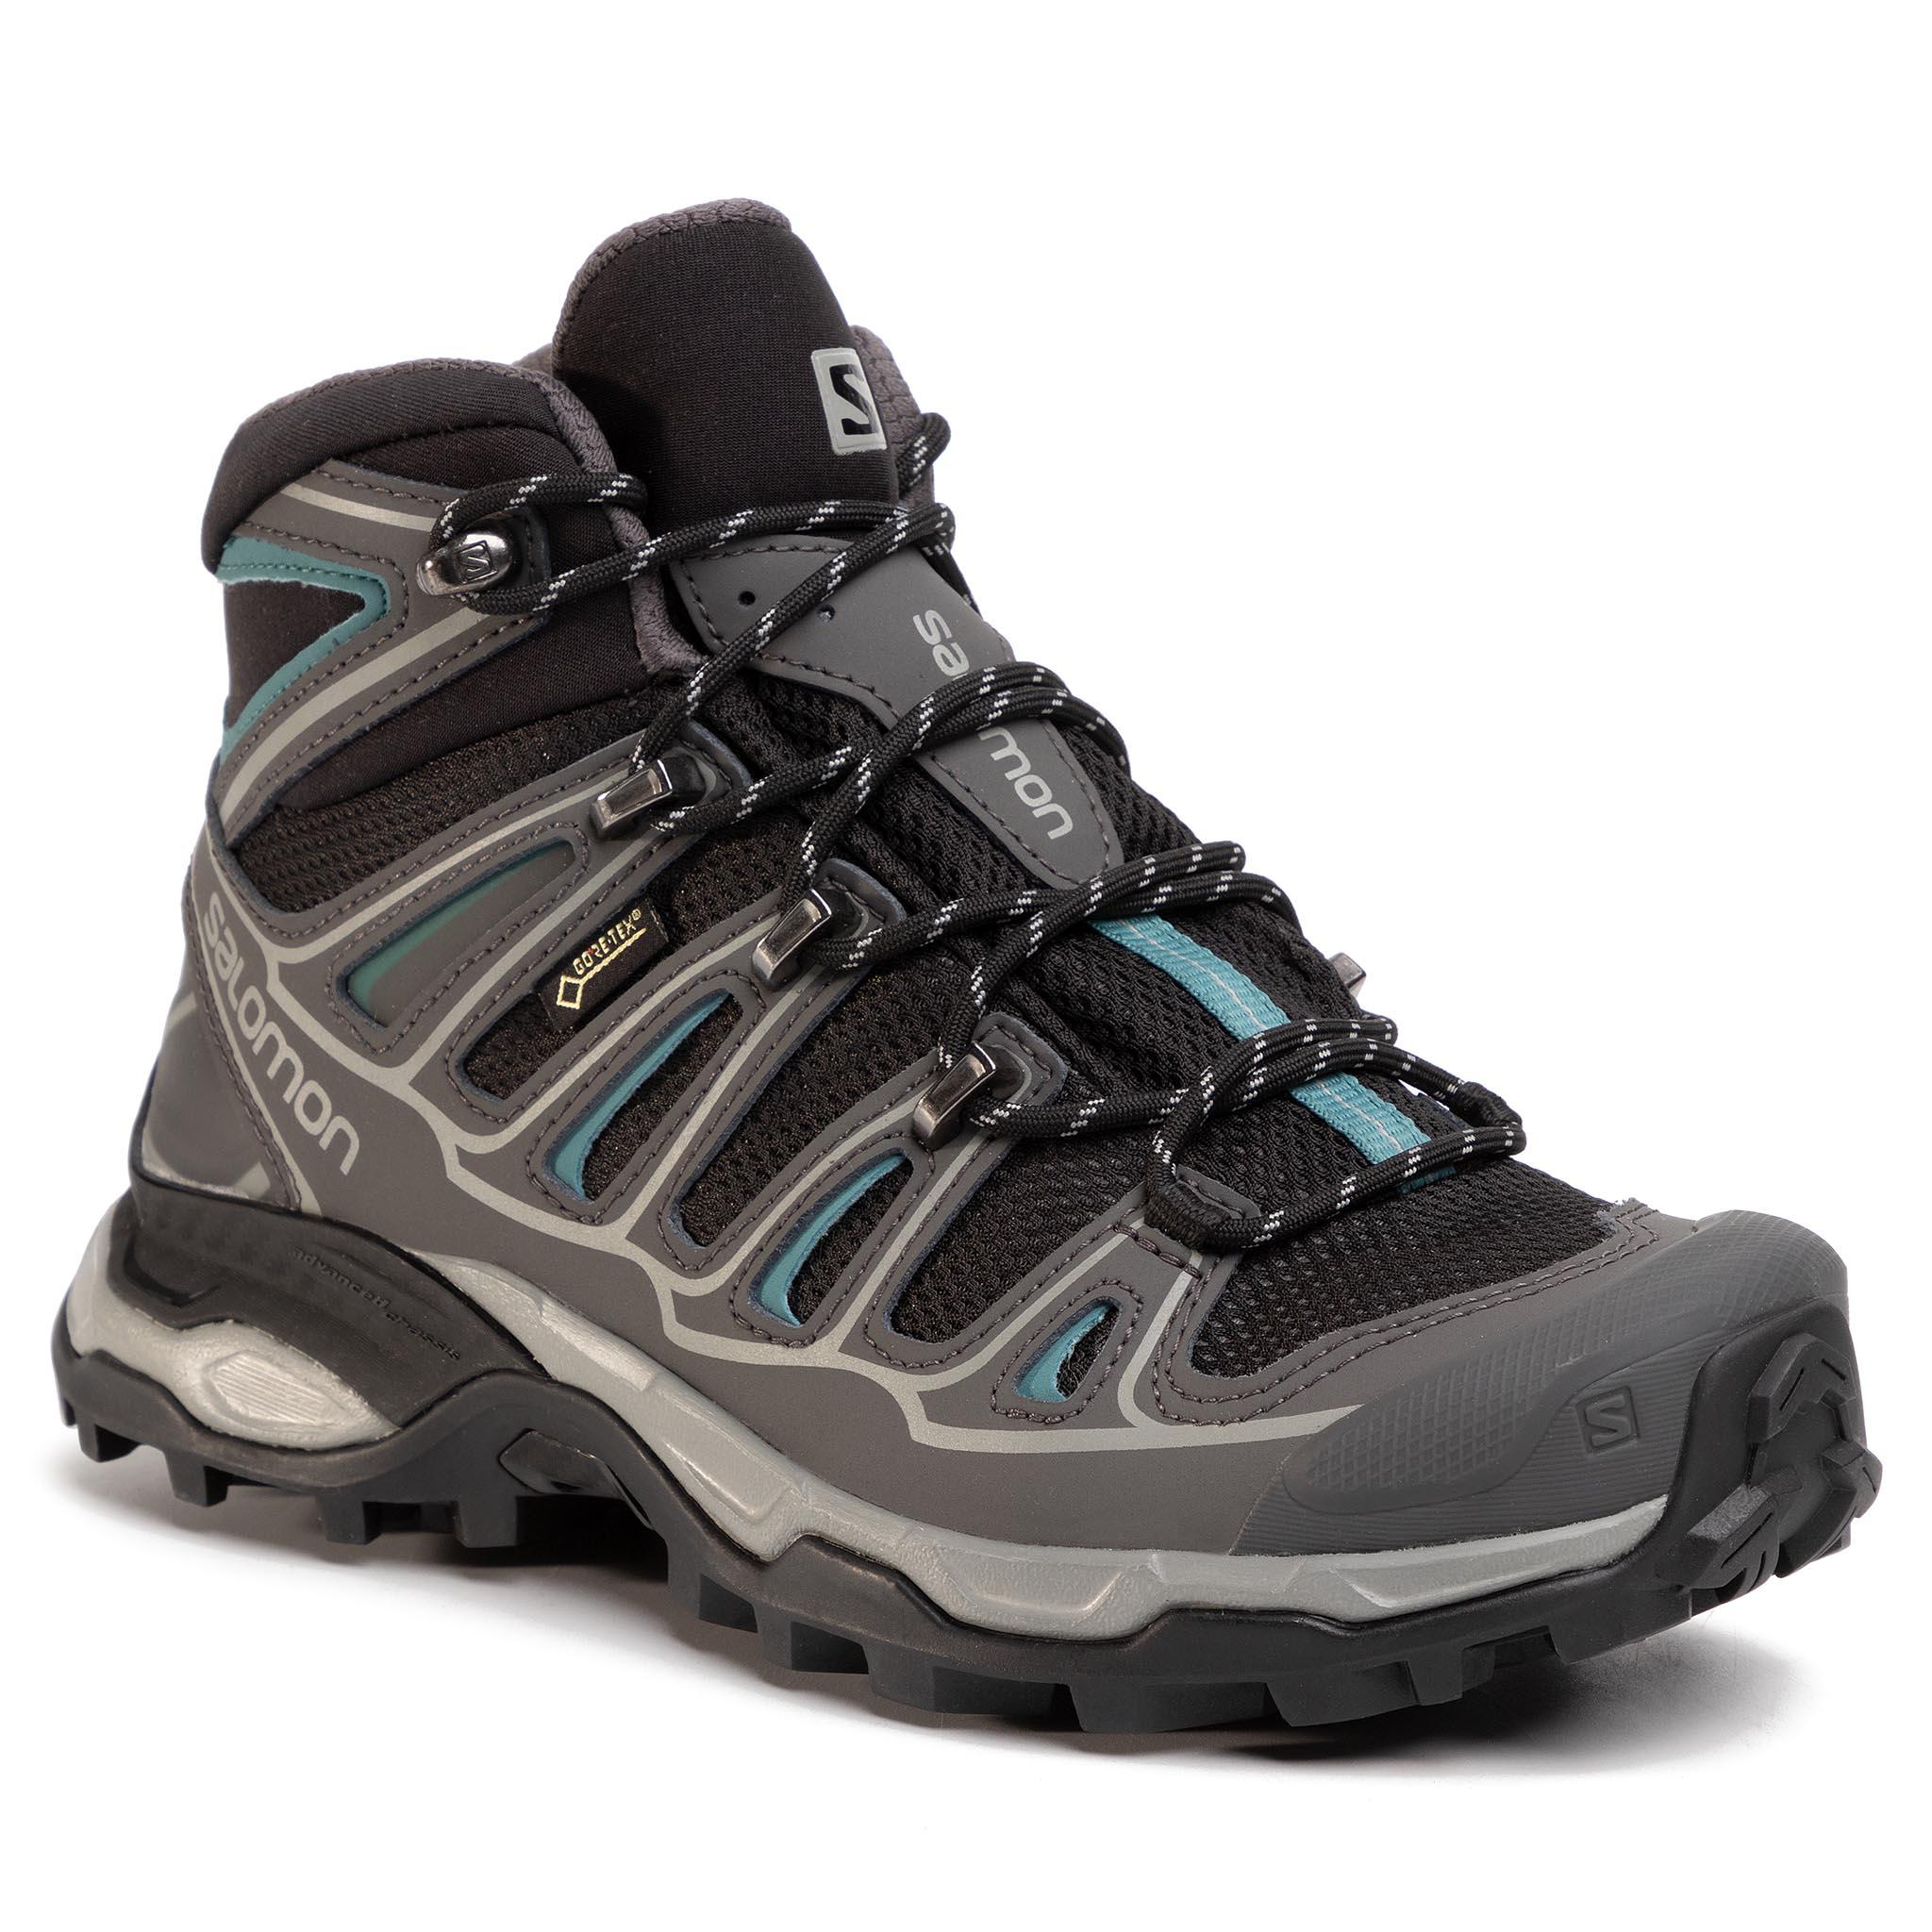 Trekingová obuv SALOMON - X Ultra Mid 2 W Spikes Gtx 404751 21 V0 Black/Magent/Hydro.